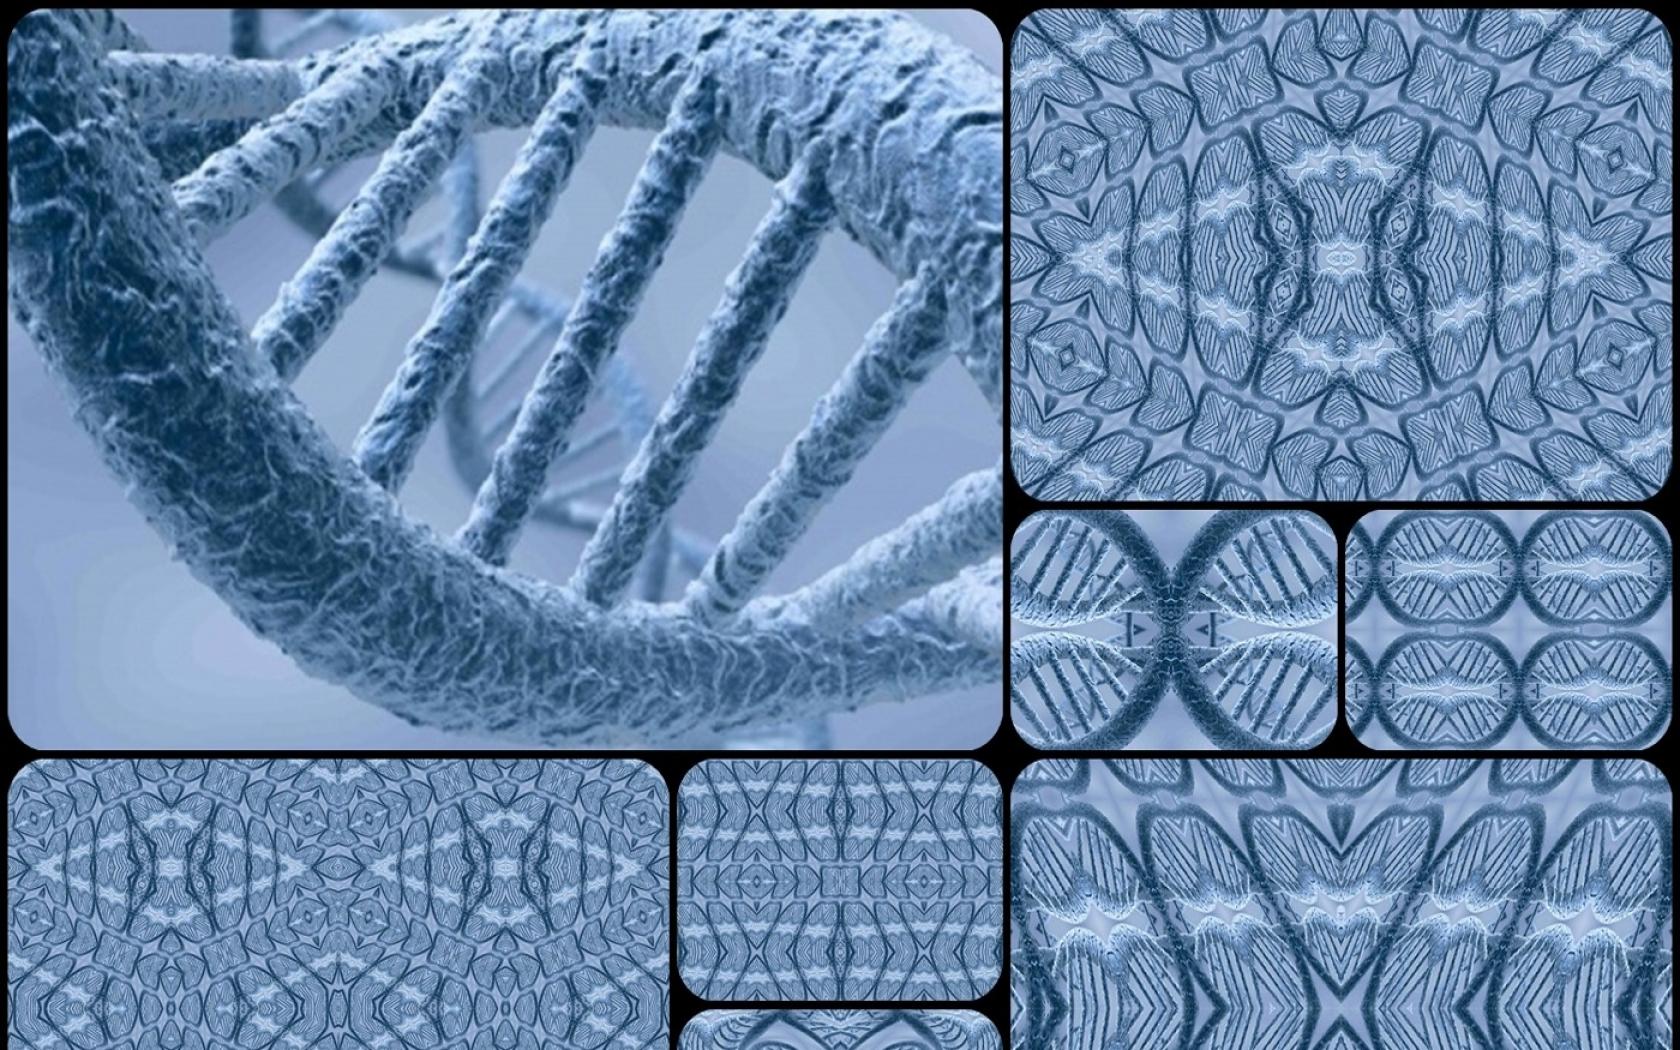 biology dna cells biochemistry 1400x1050 wallpaper Anime HD Wallpaper 1680x1050